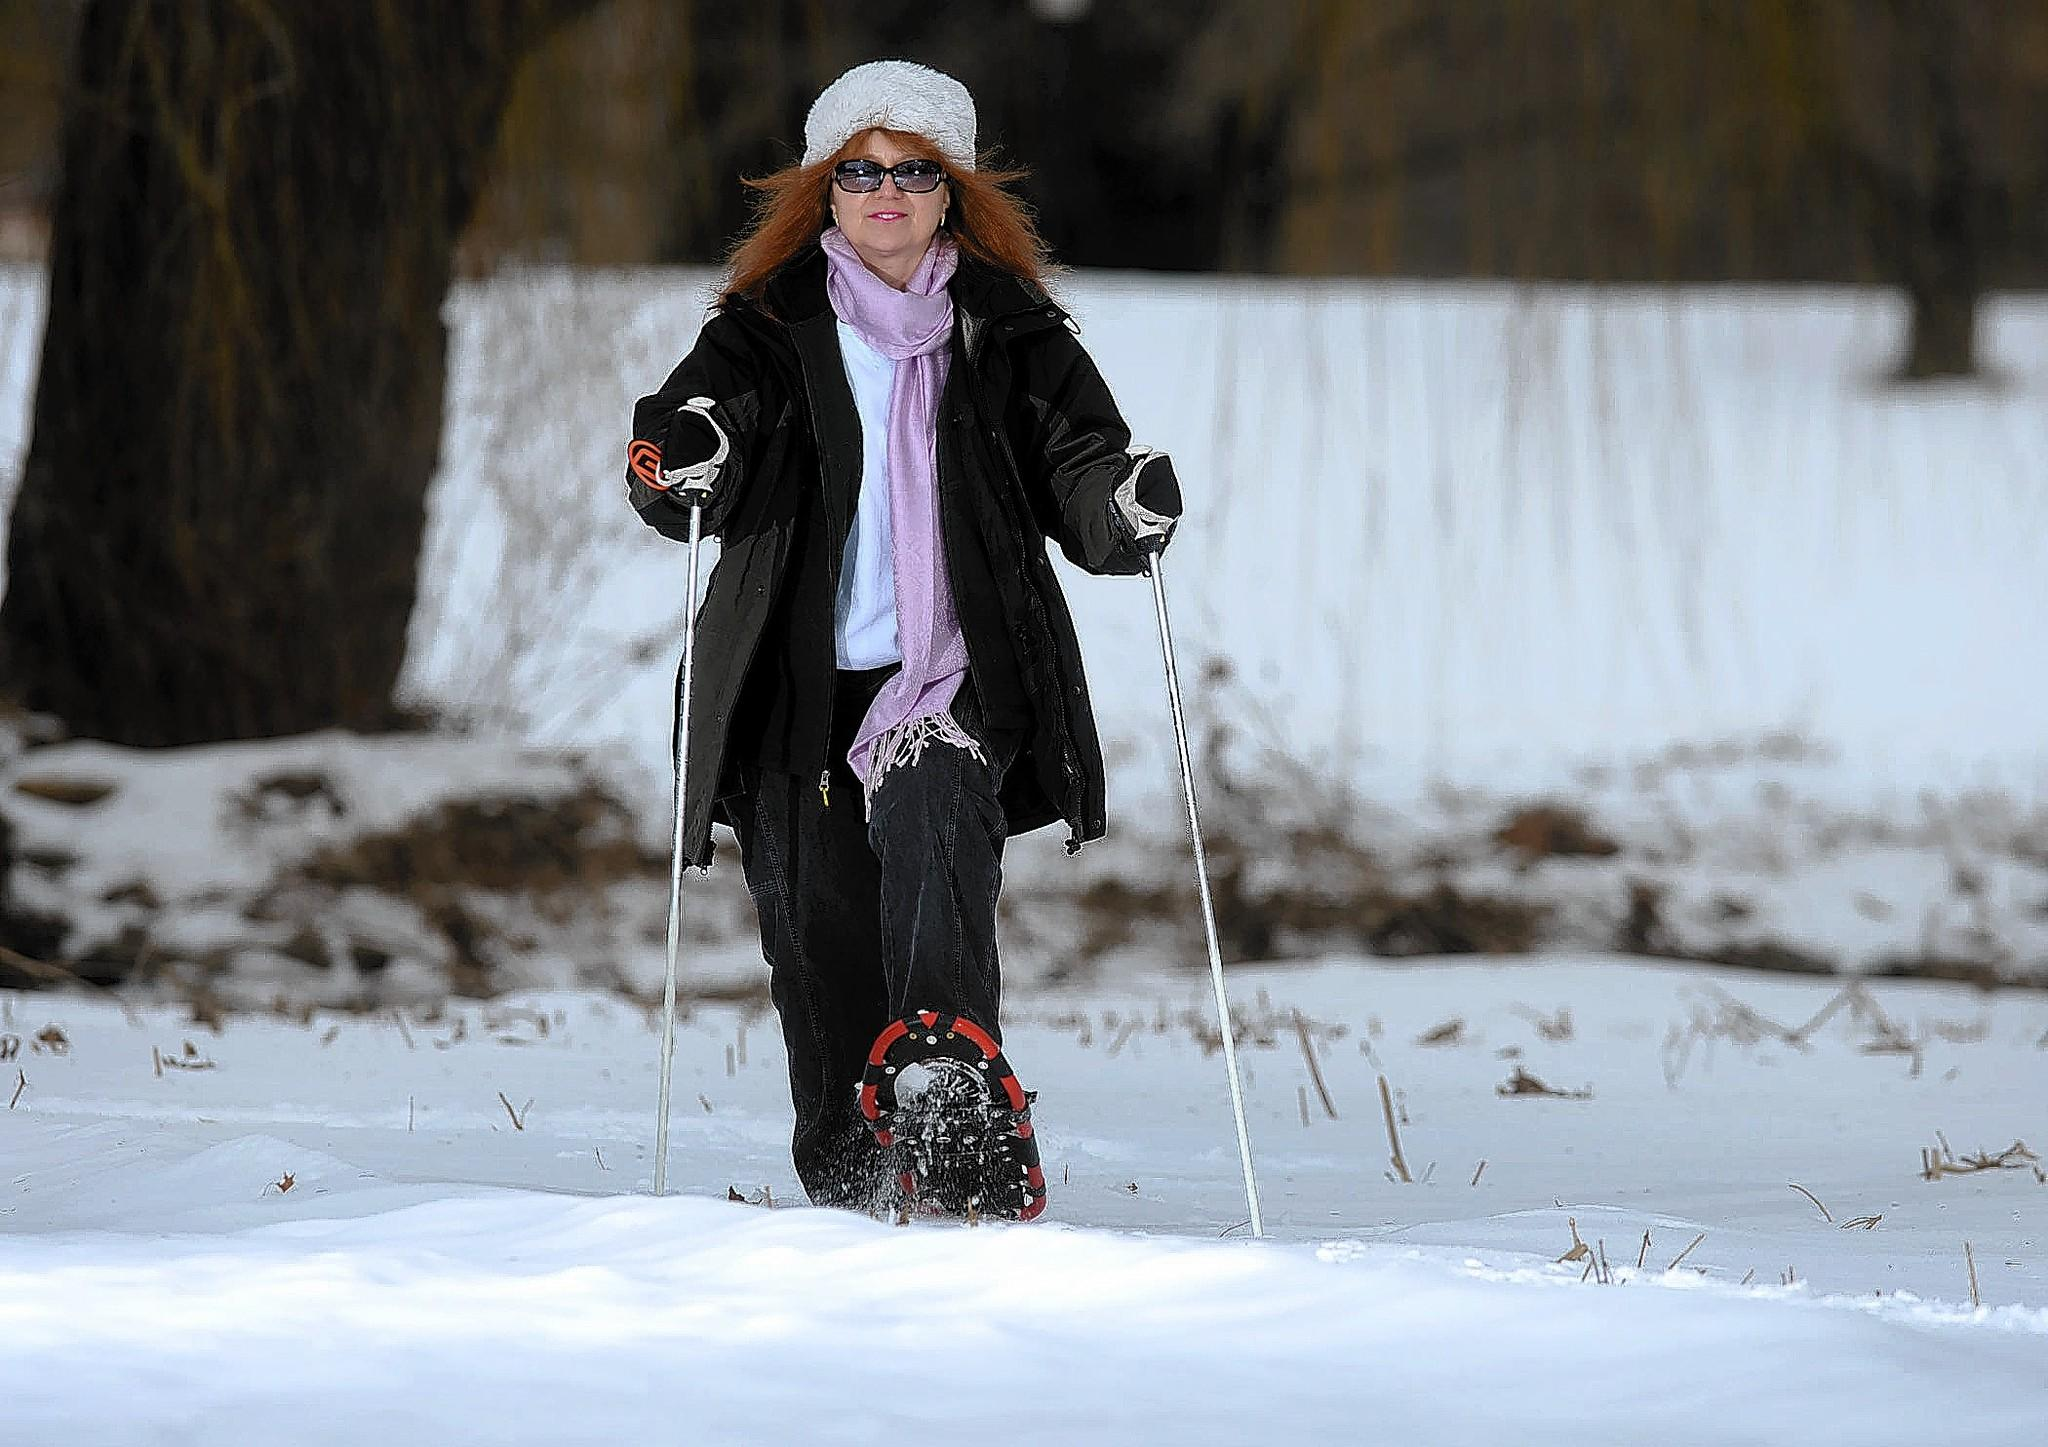 Karen El Chaar of Friends of the Allentown Parks demonstrates snow shoeing in anticipation of Allentown's Winterfest at Cedar Creek Parkway in Allentown Feb. 8.